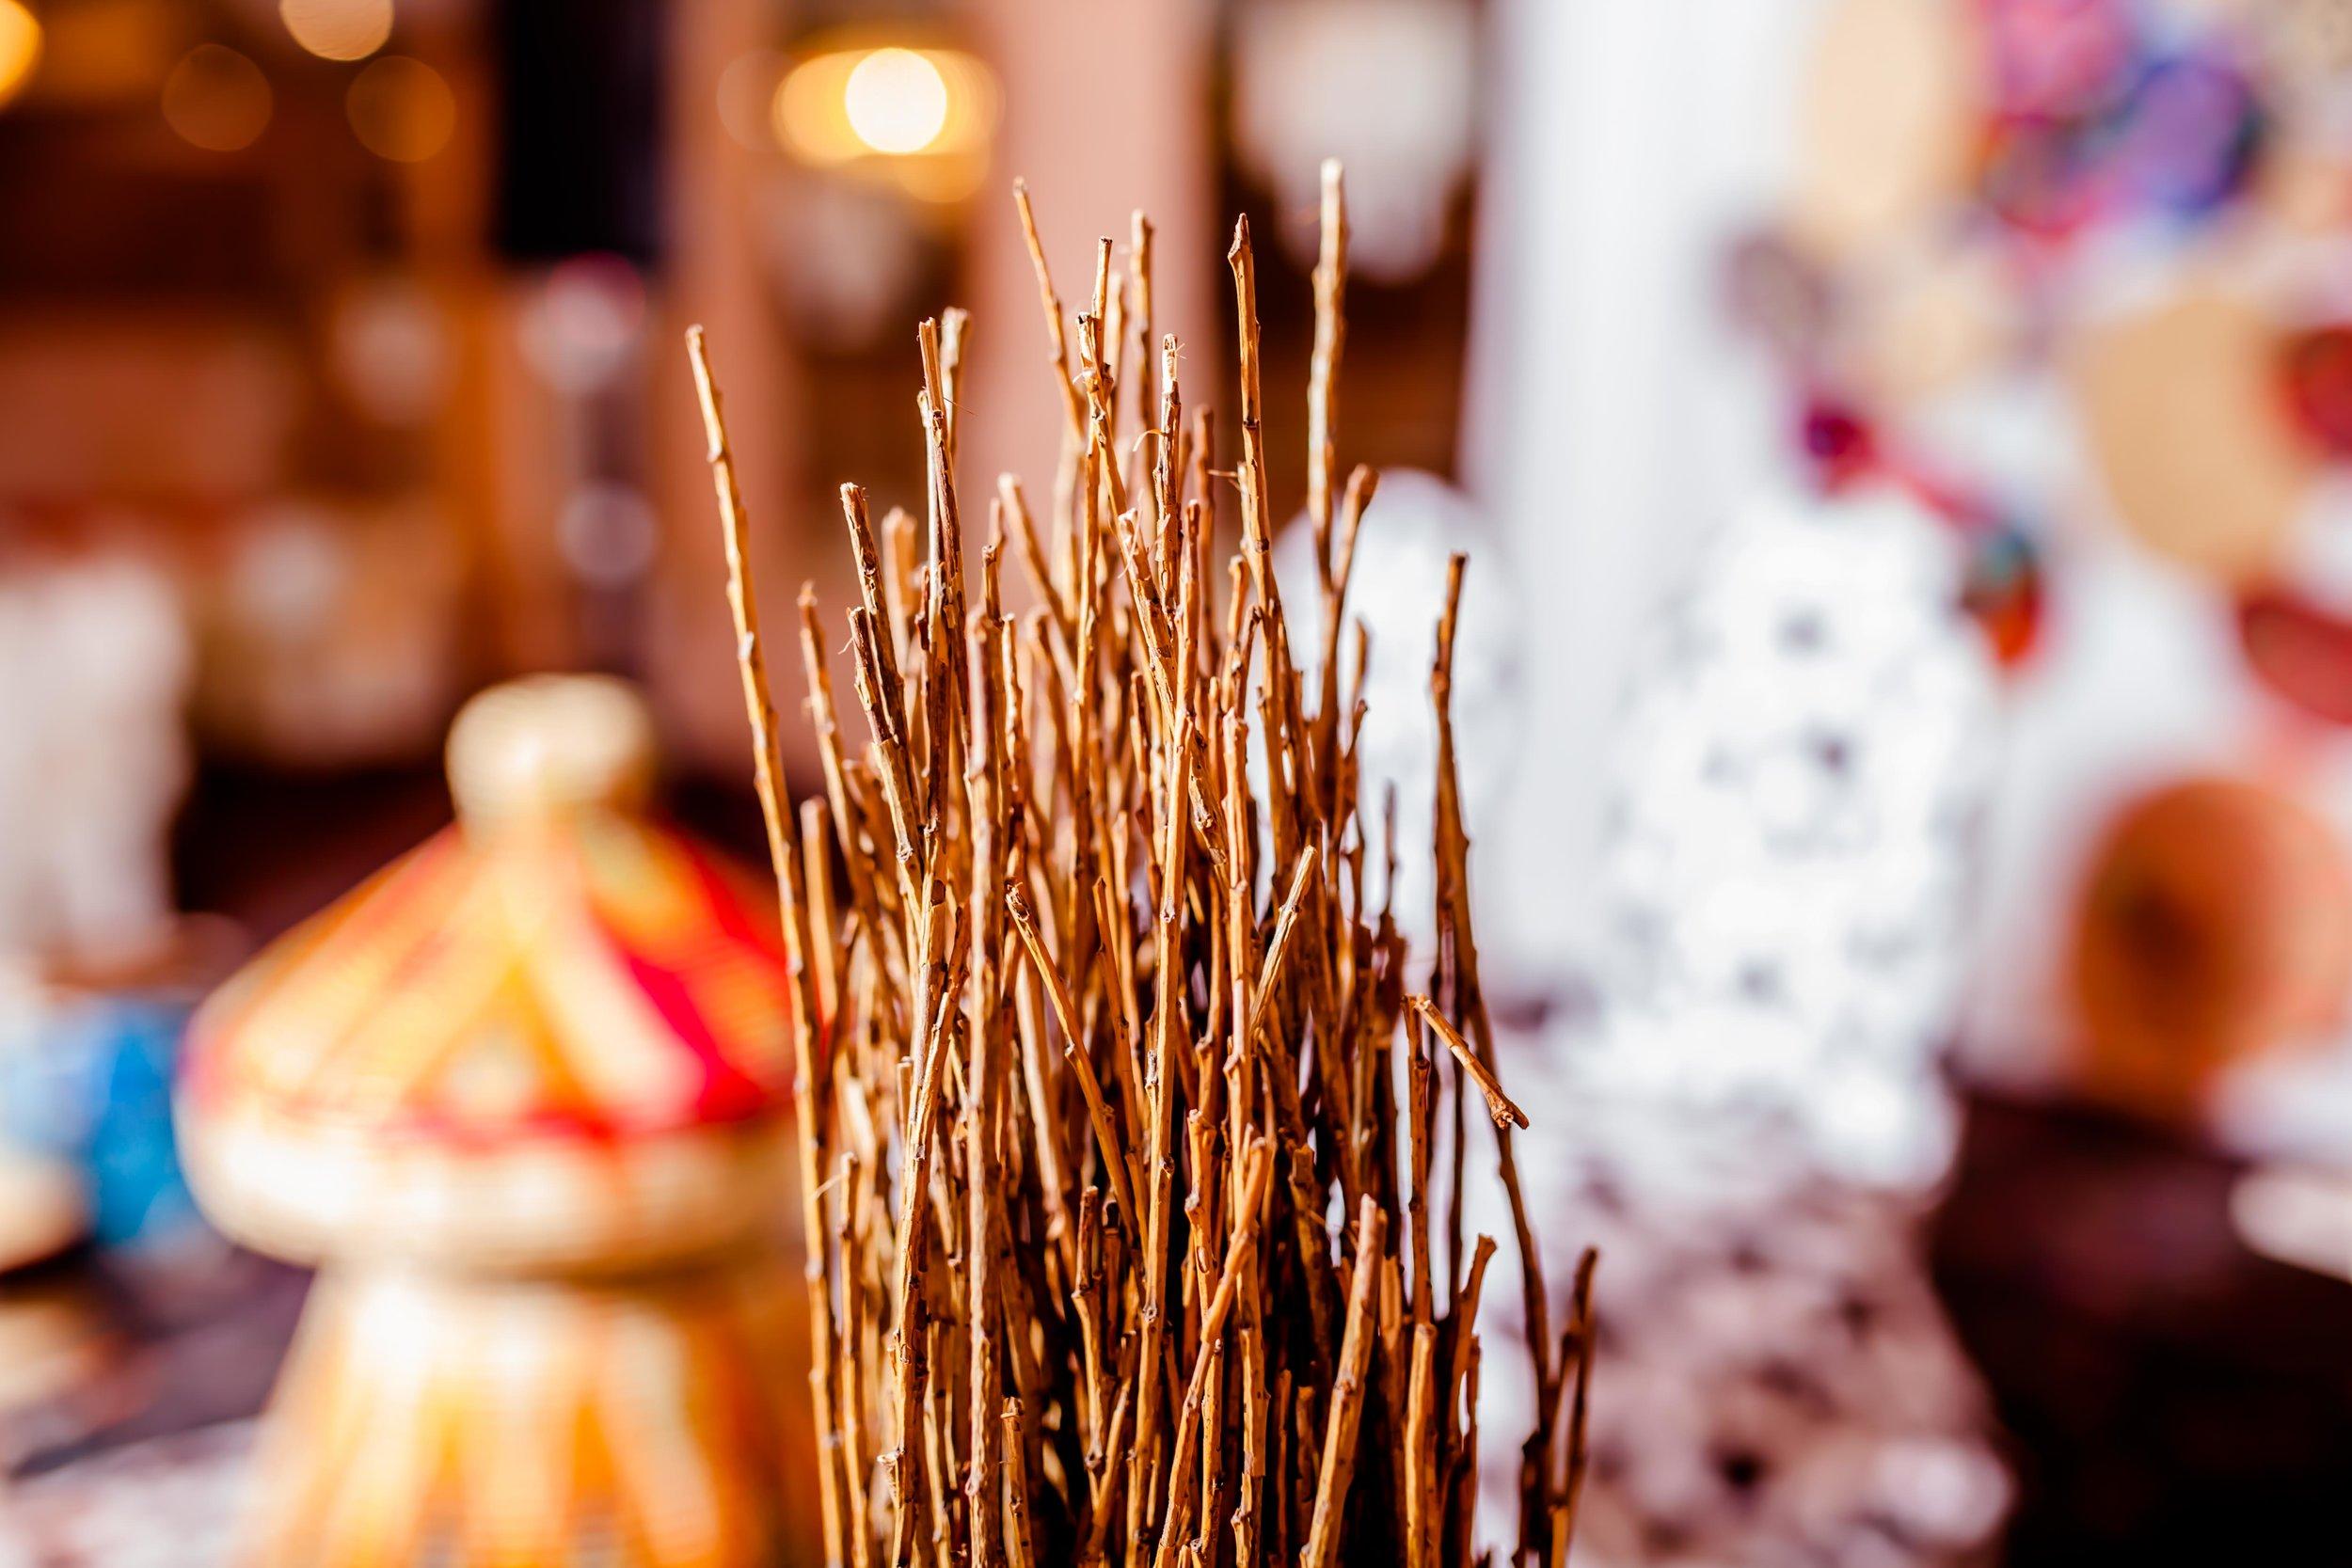 Wedding Details Red Eritrean Habesha Arab Wedding Toronto Scarborough Convention Centre Blog Markham Rami Decor Grand Stage Ethiopian Canada Ontario Photographer Karimah Gheddai Melse